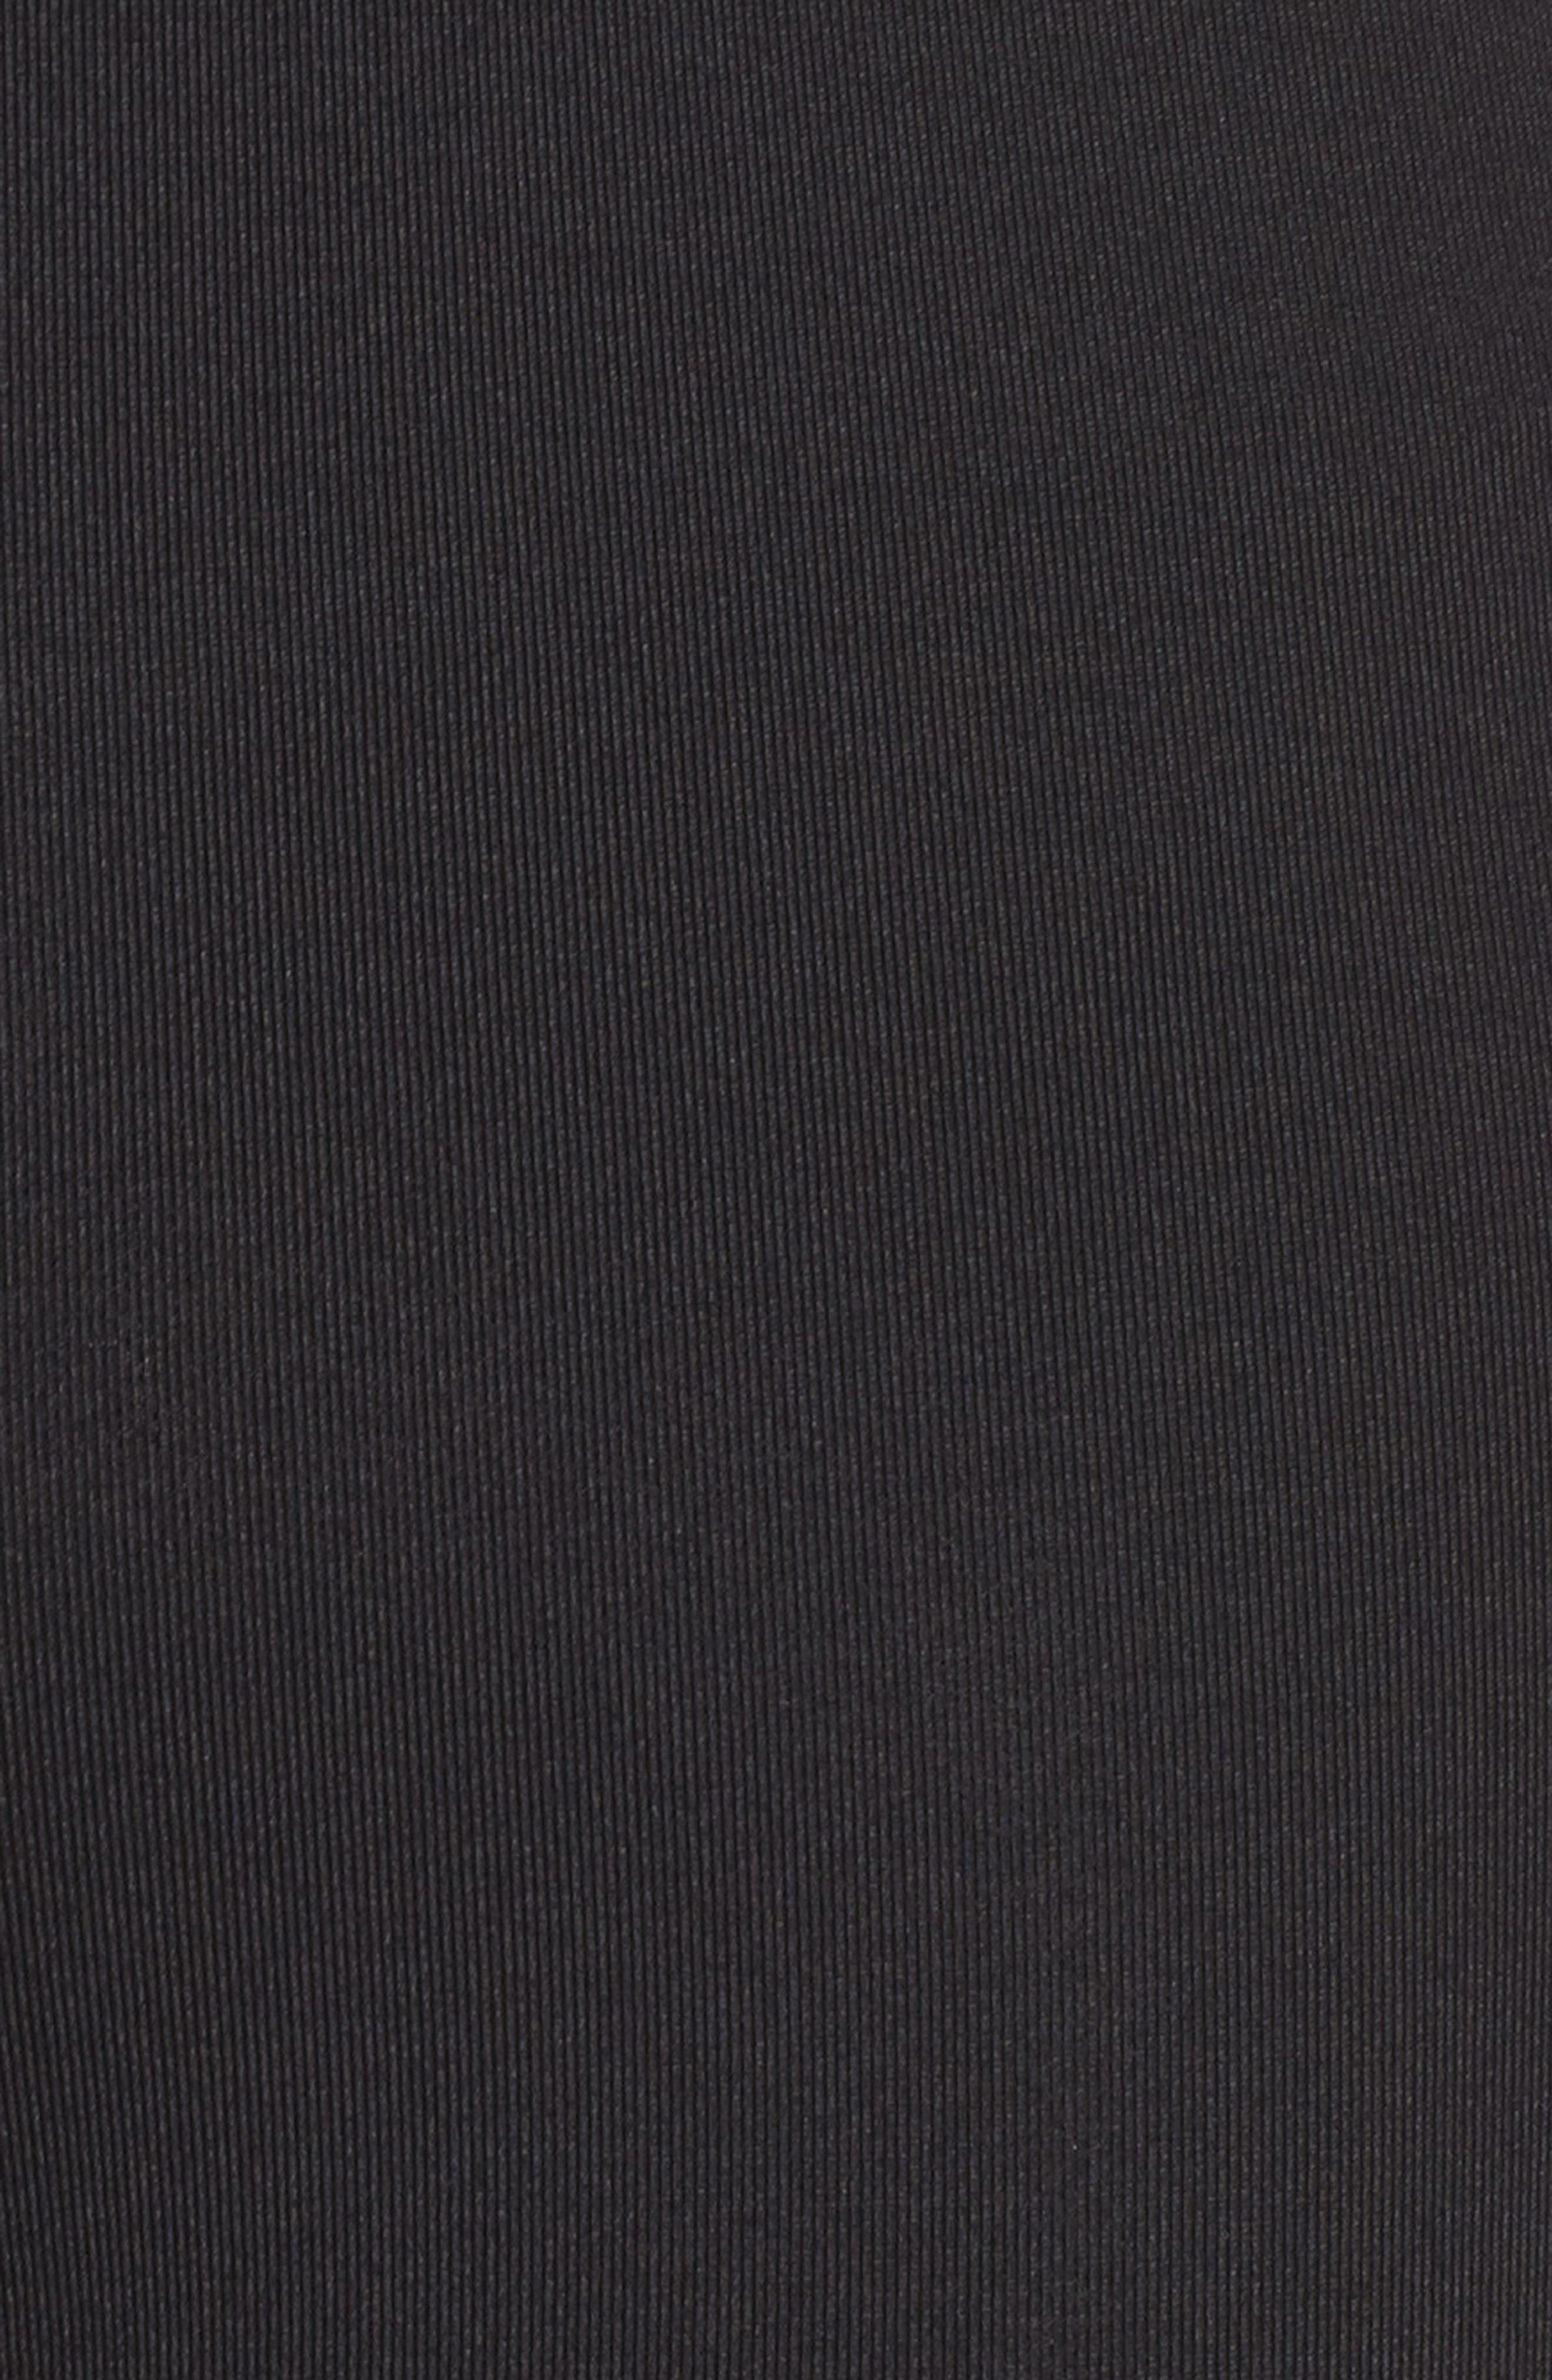 Tone High Waist Leggings,                             Alternate thumbnail 5, color,                             001